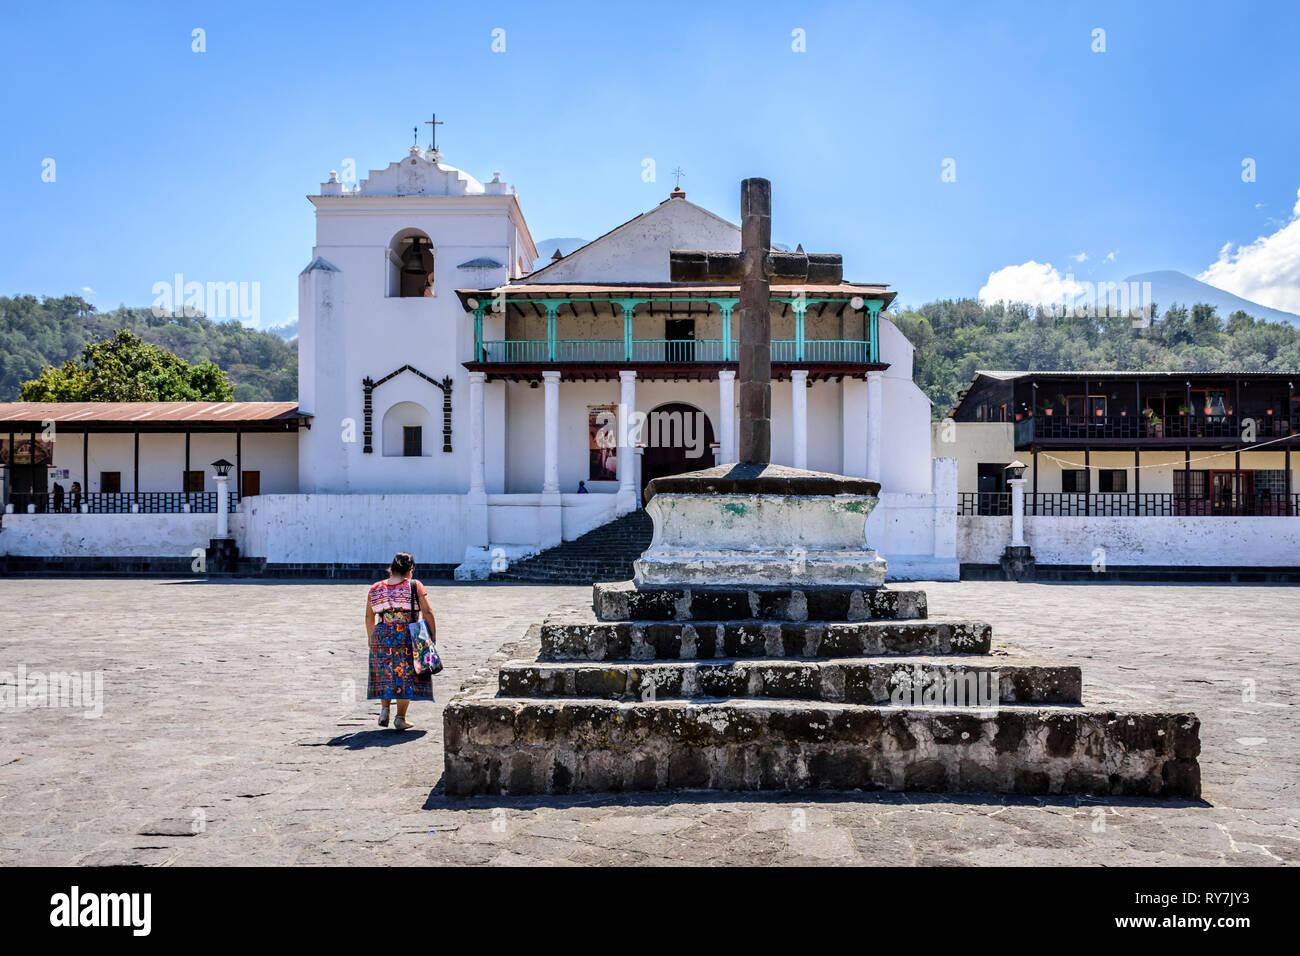 Santiago Atitlan, Lake Atitlan, Guatemala - March 8, 2019: Maya woman walks across plaza to Catholic church in lakeside town in Guatemalan highlands. - Stock Image